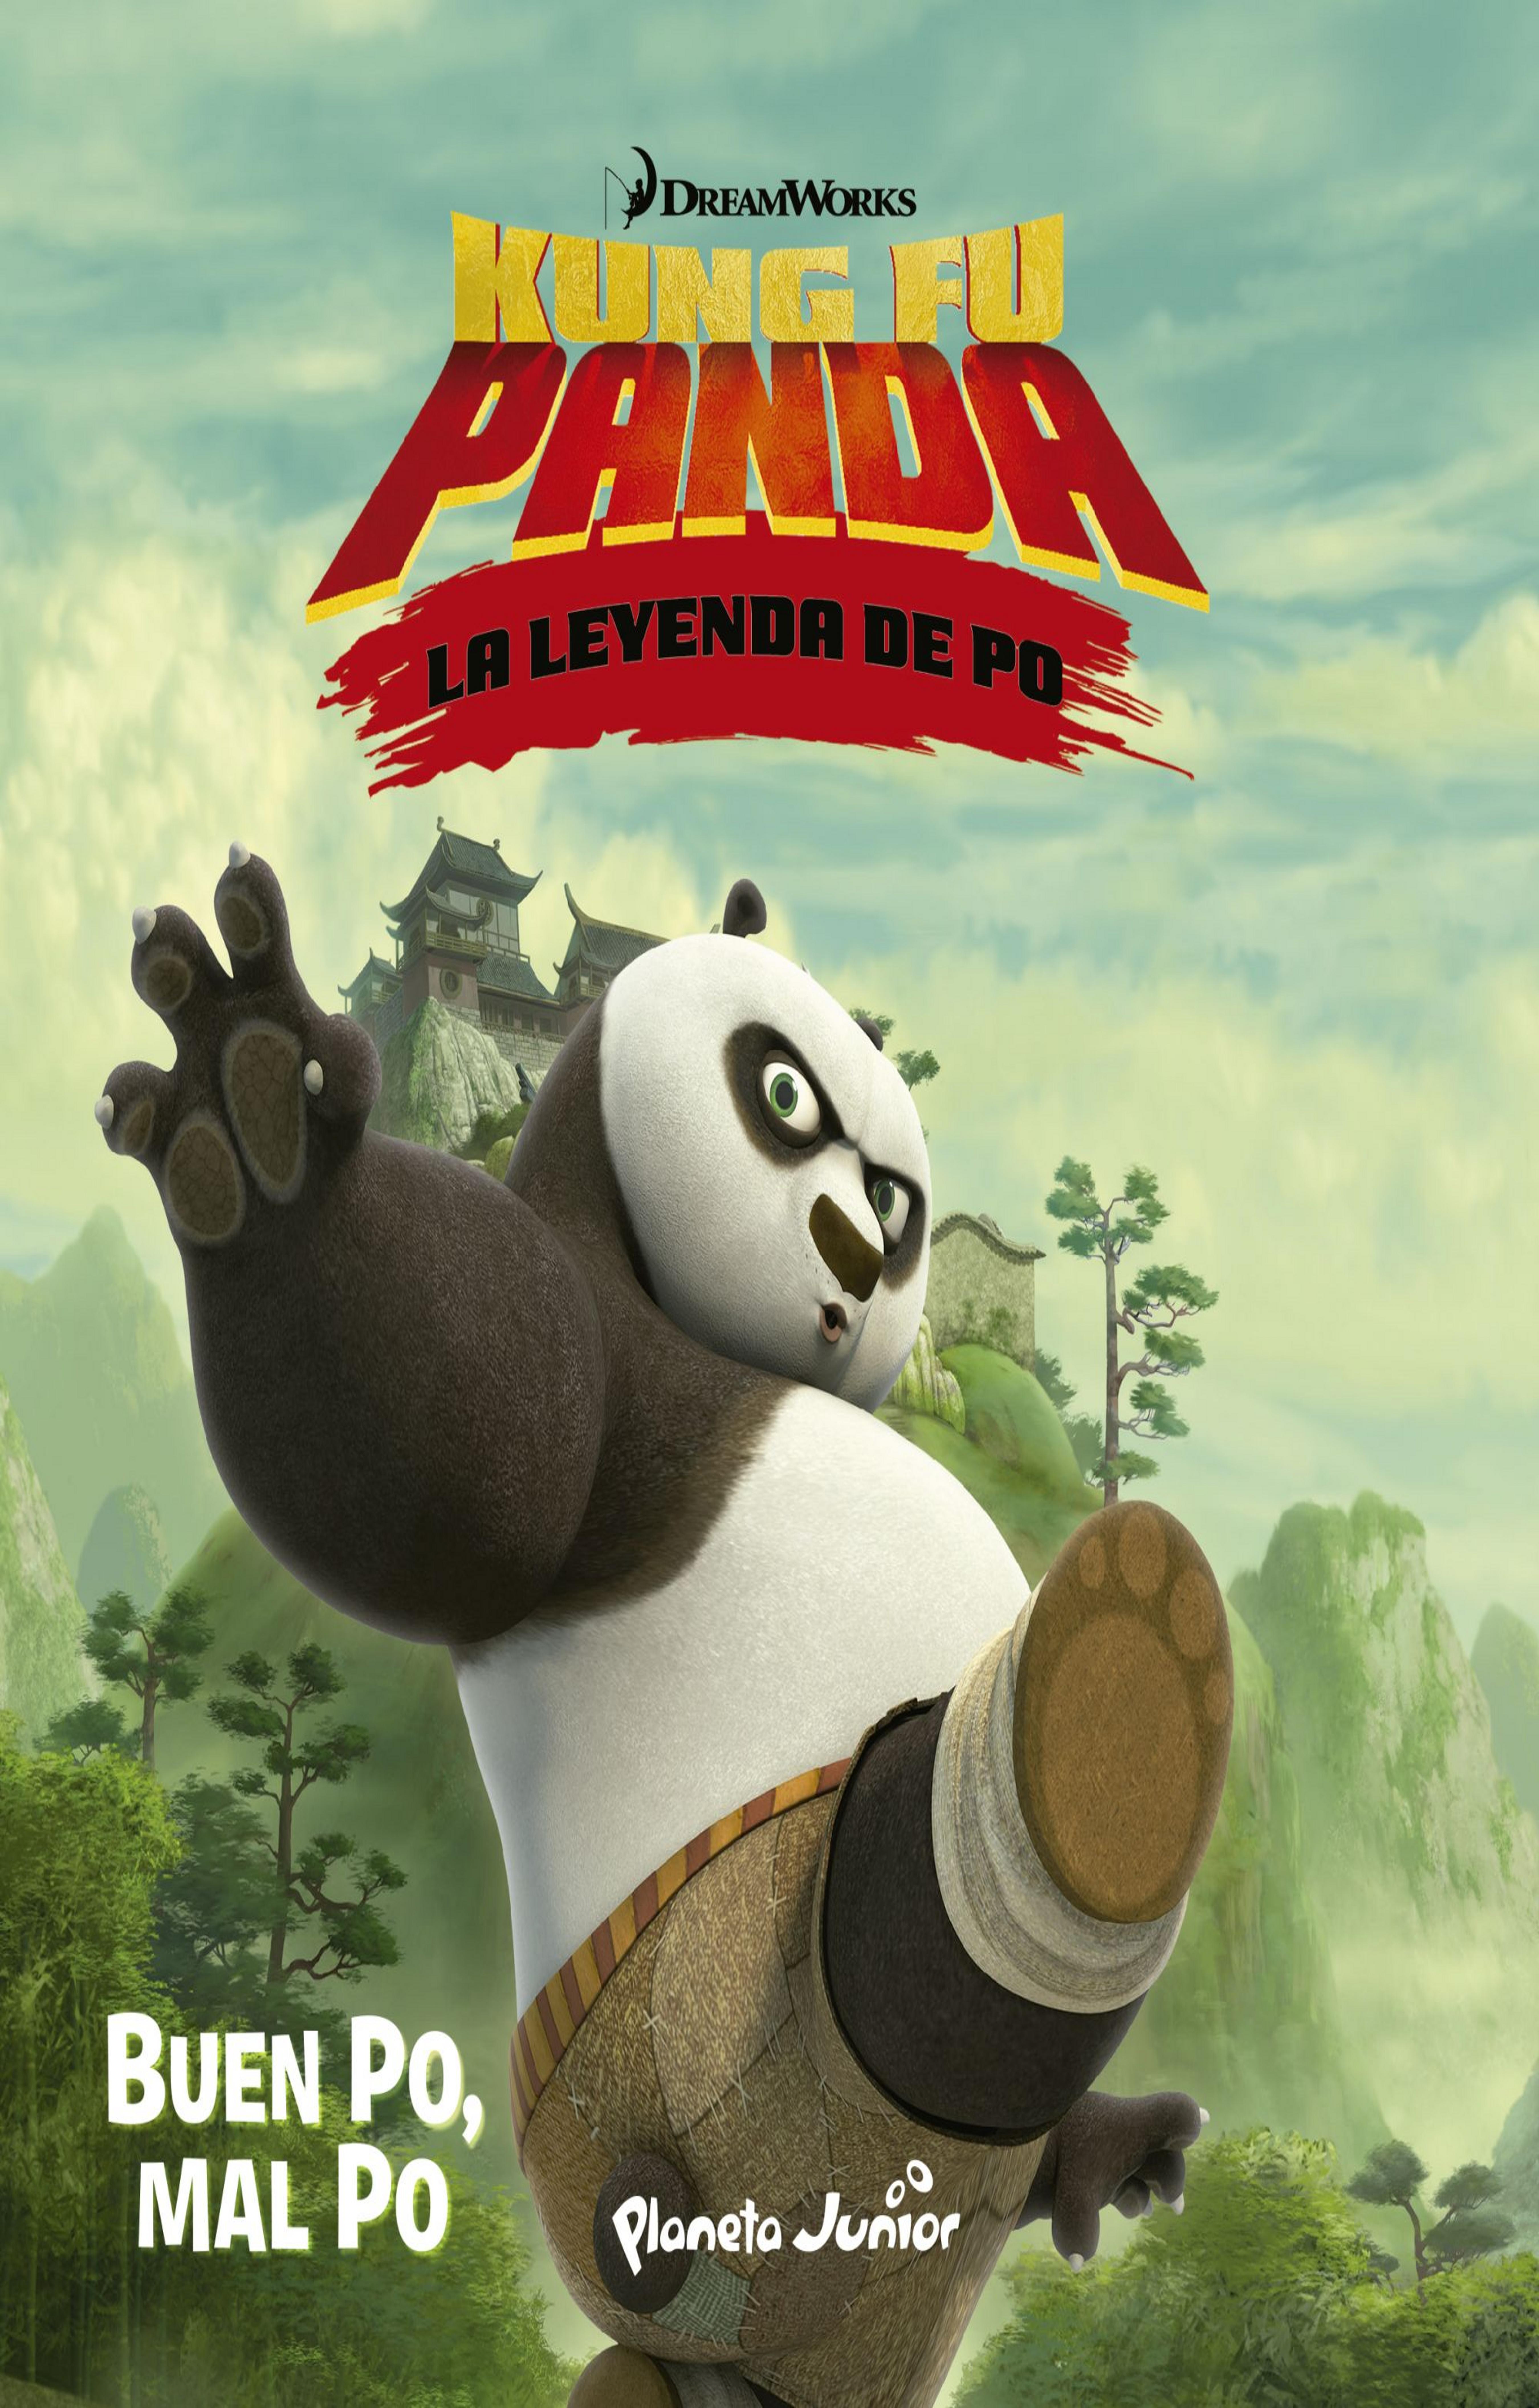 BUEN PO, MAL PO - Kung Fu Panda